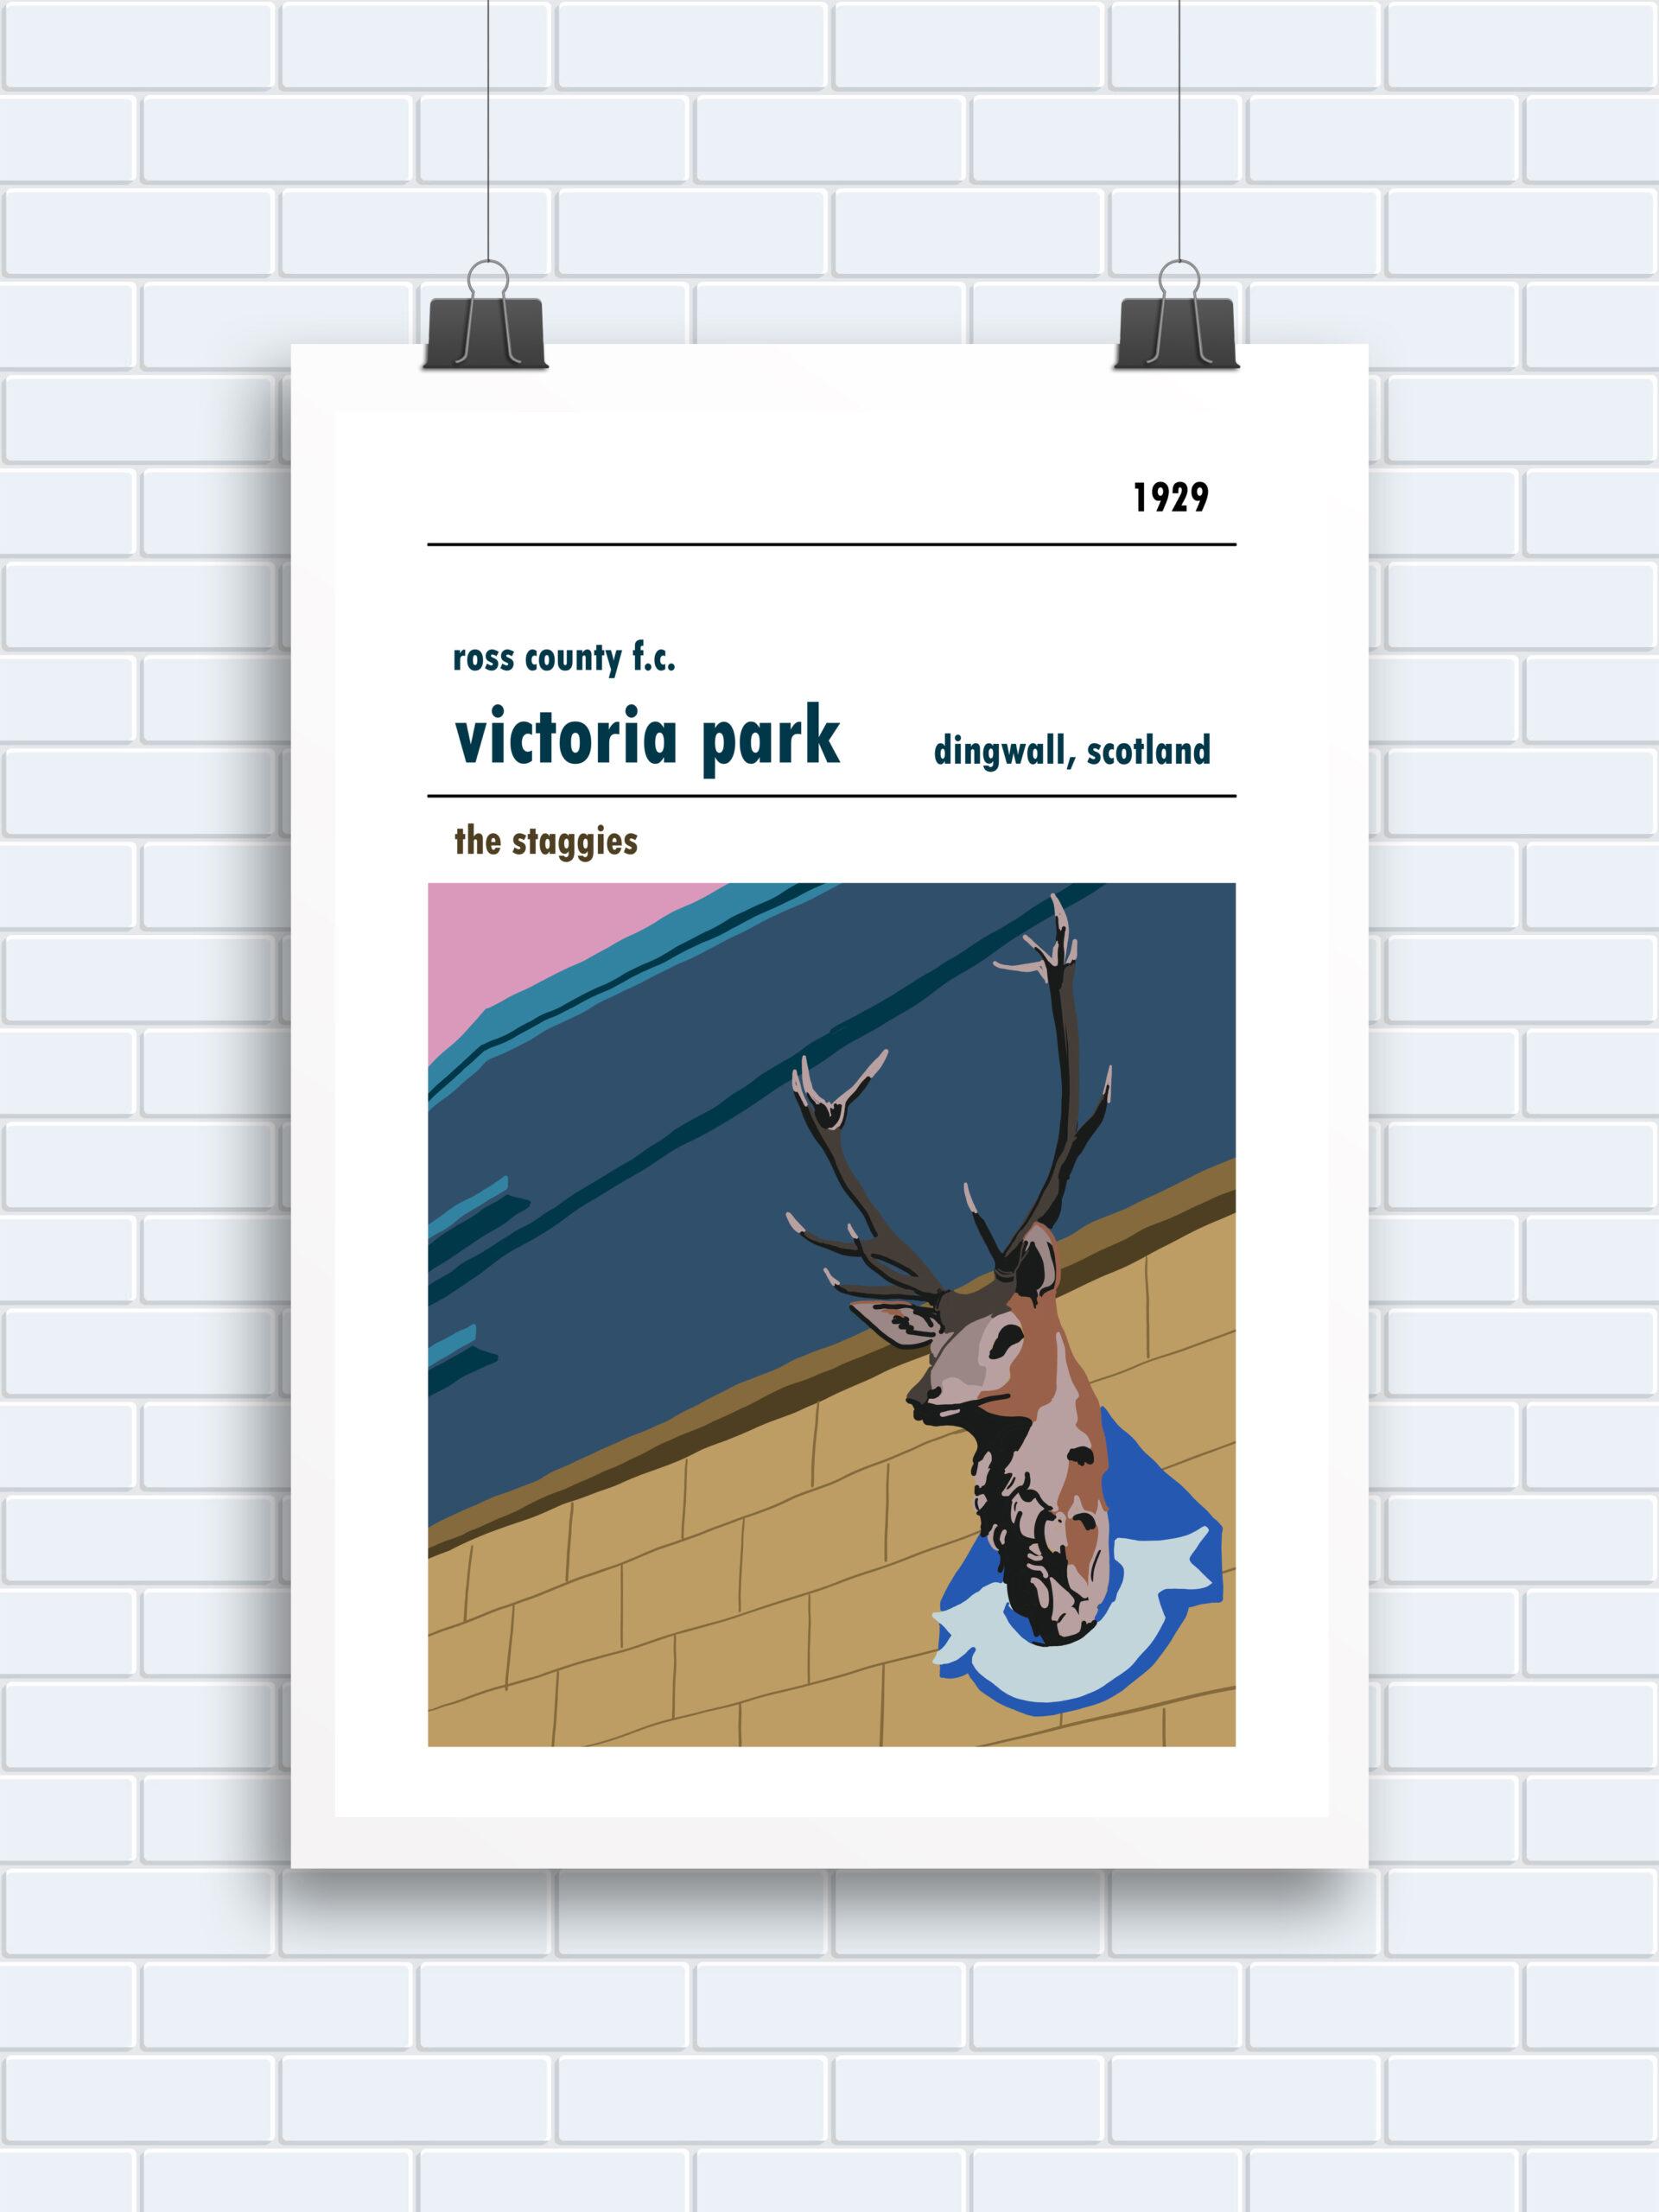 Victoria Park, Stag, Dingwall